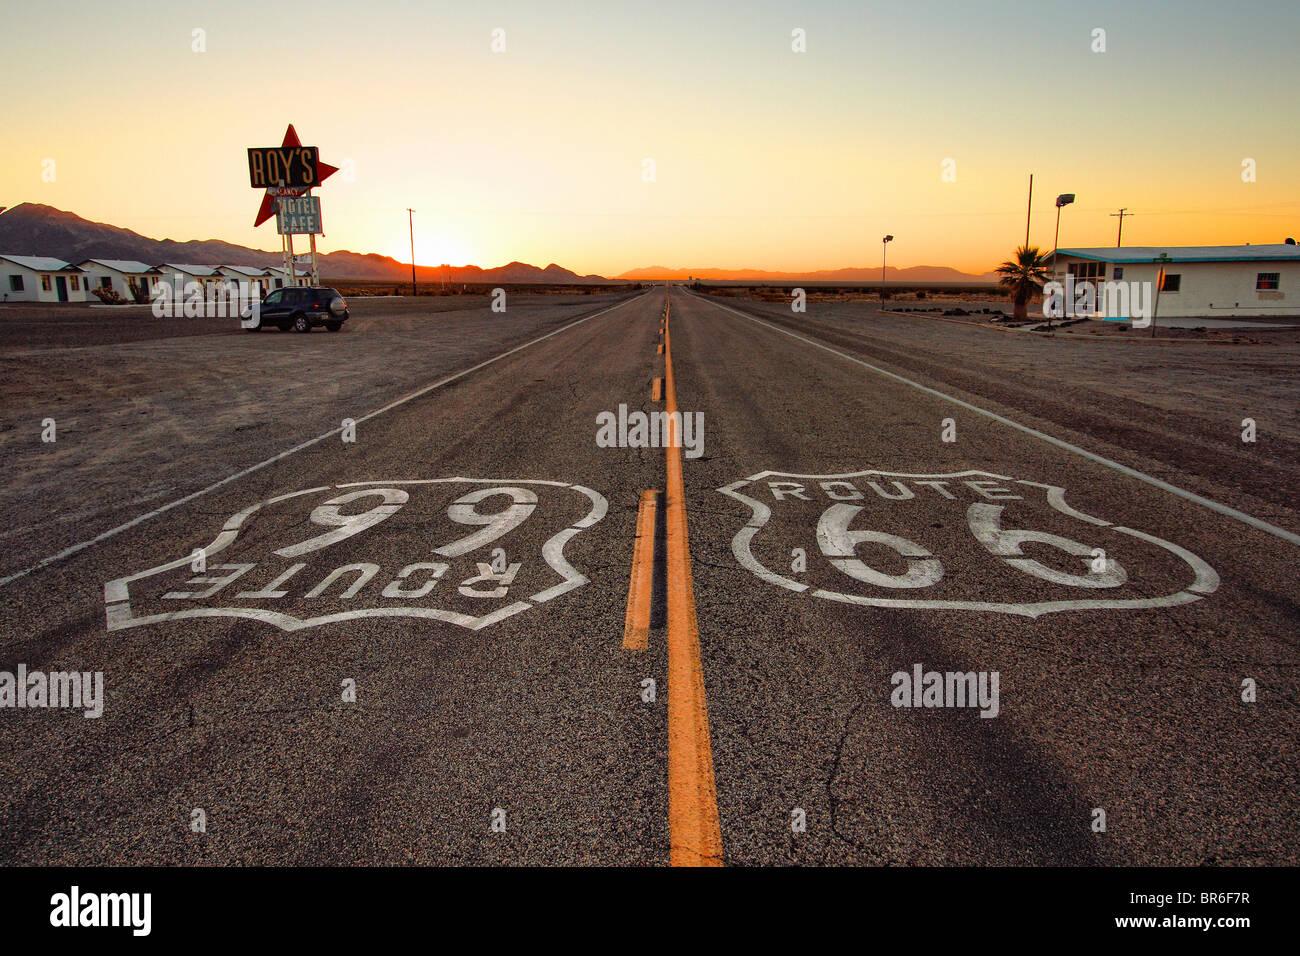 La vieja ruta 66, California, EE.UU. Foto de stock